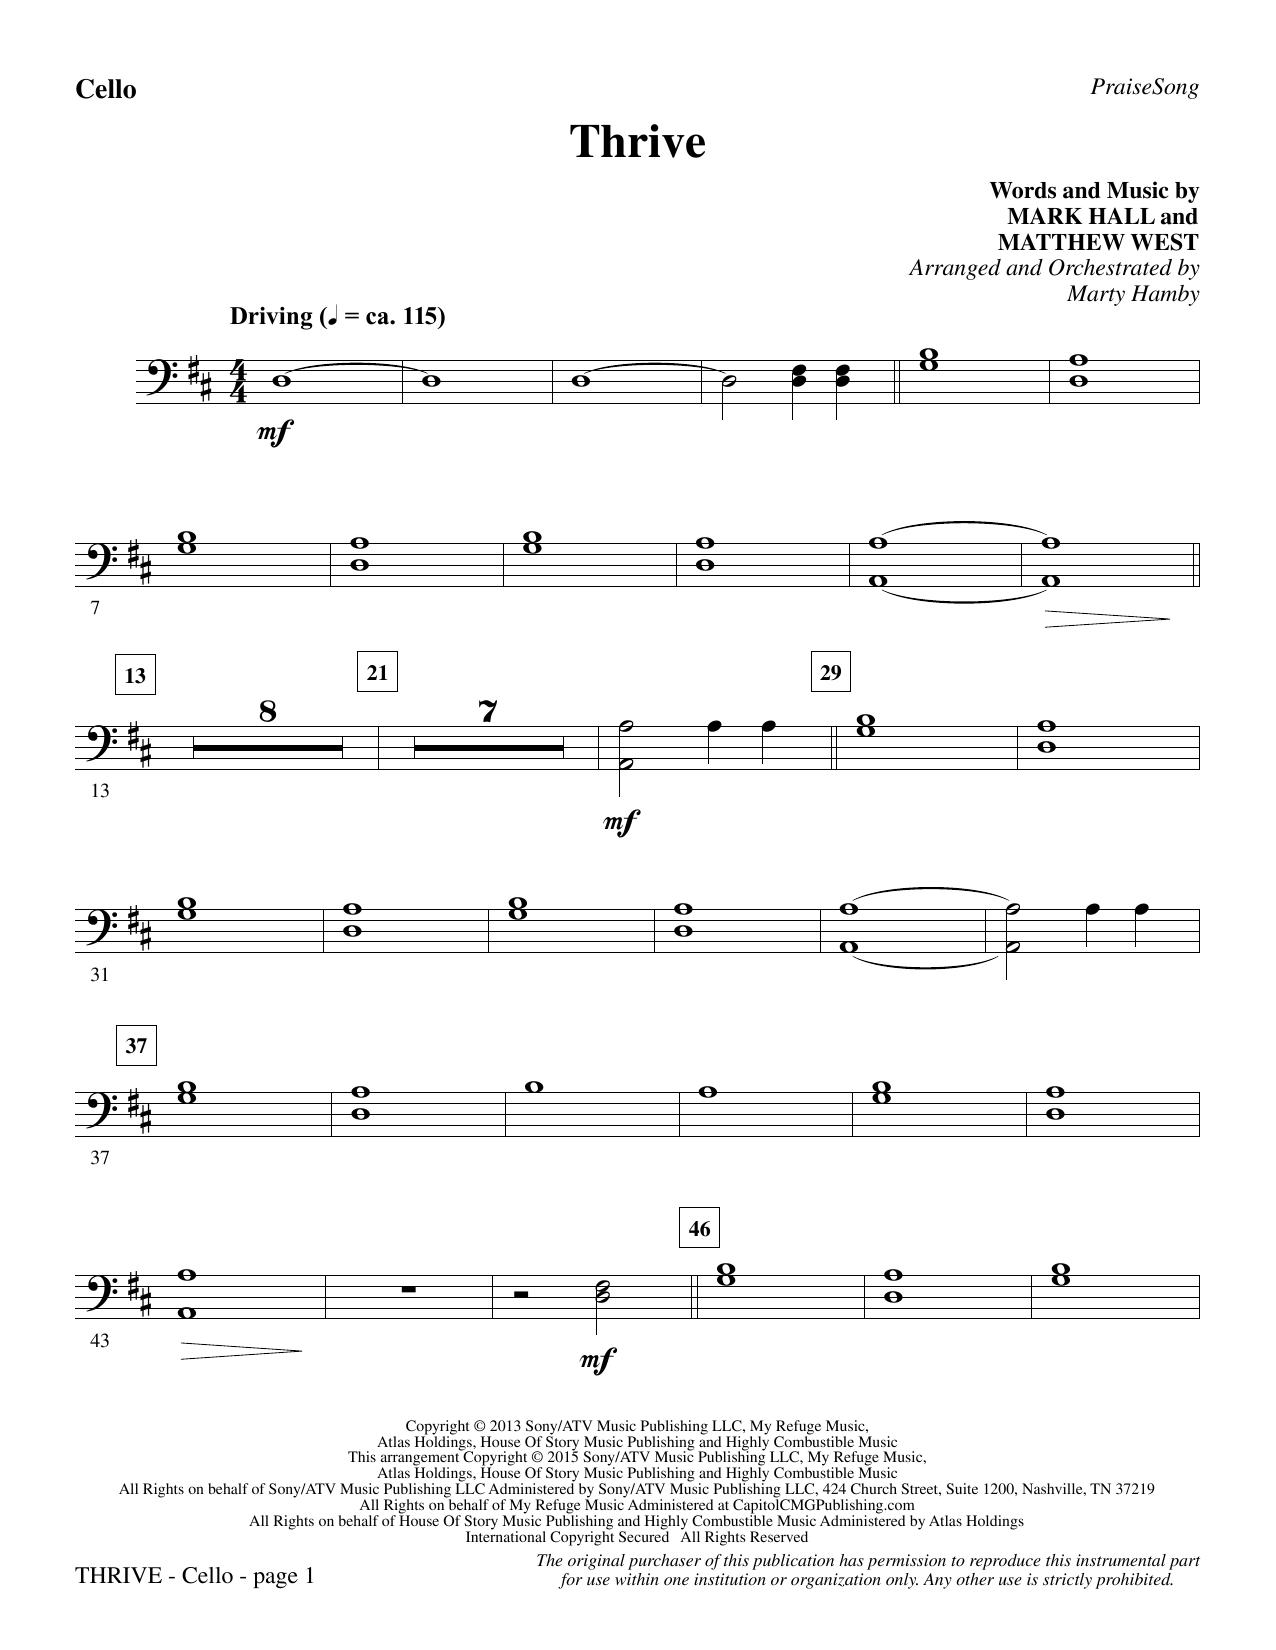 Thrive - Cello sheet music